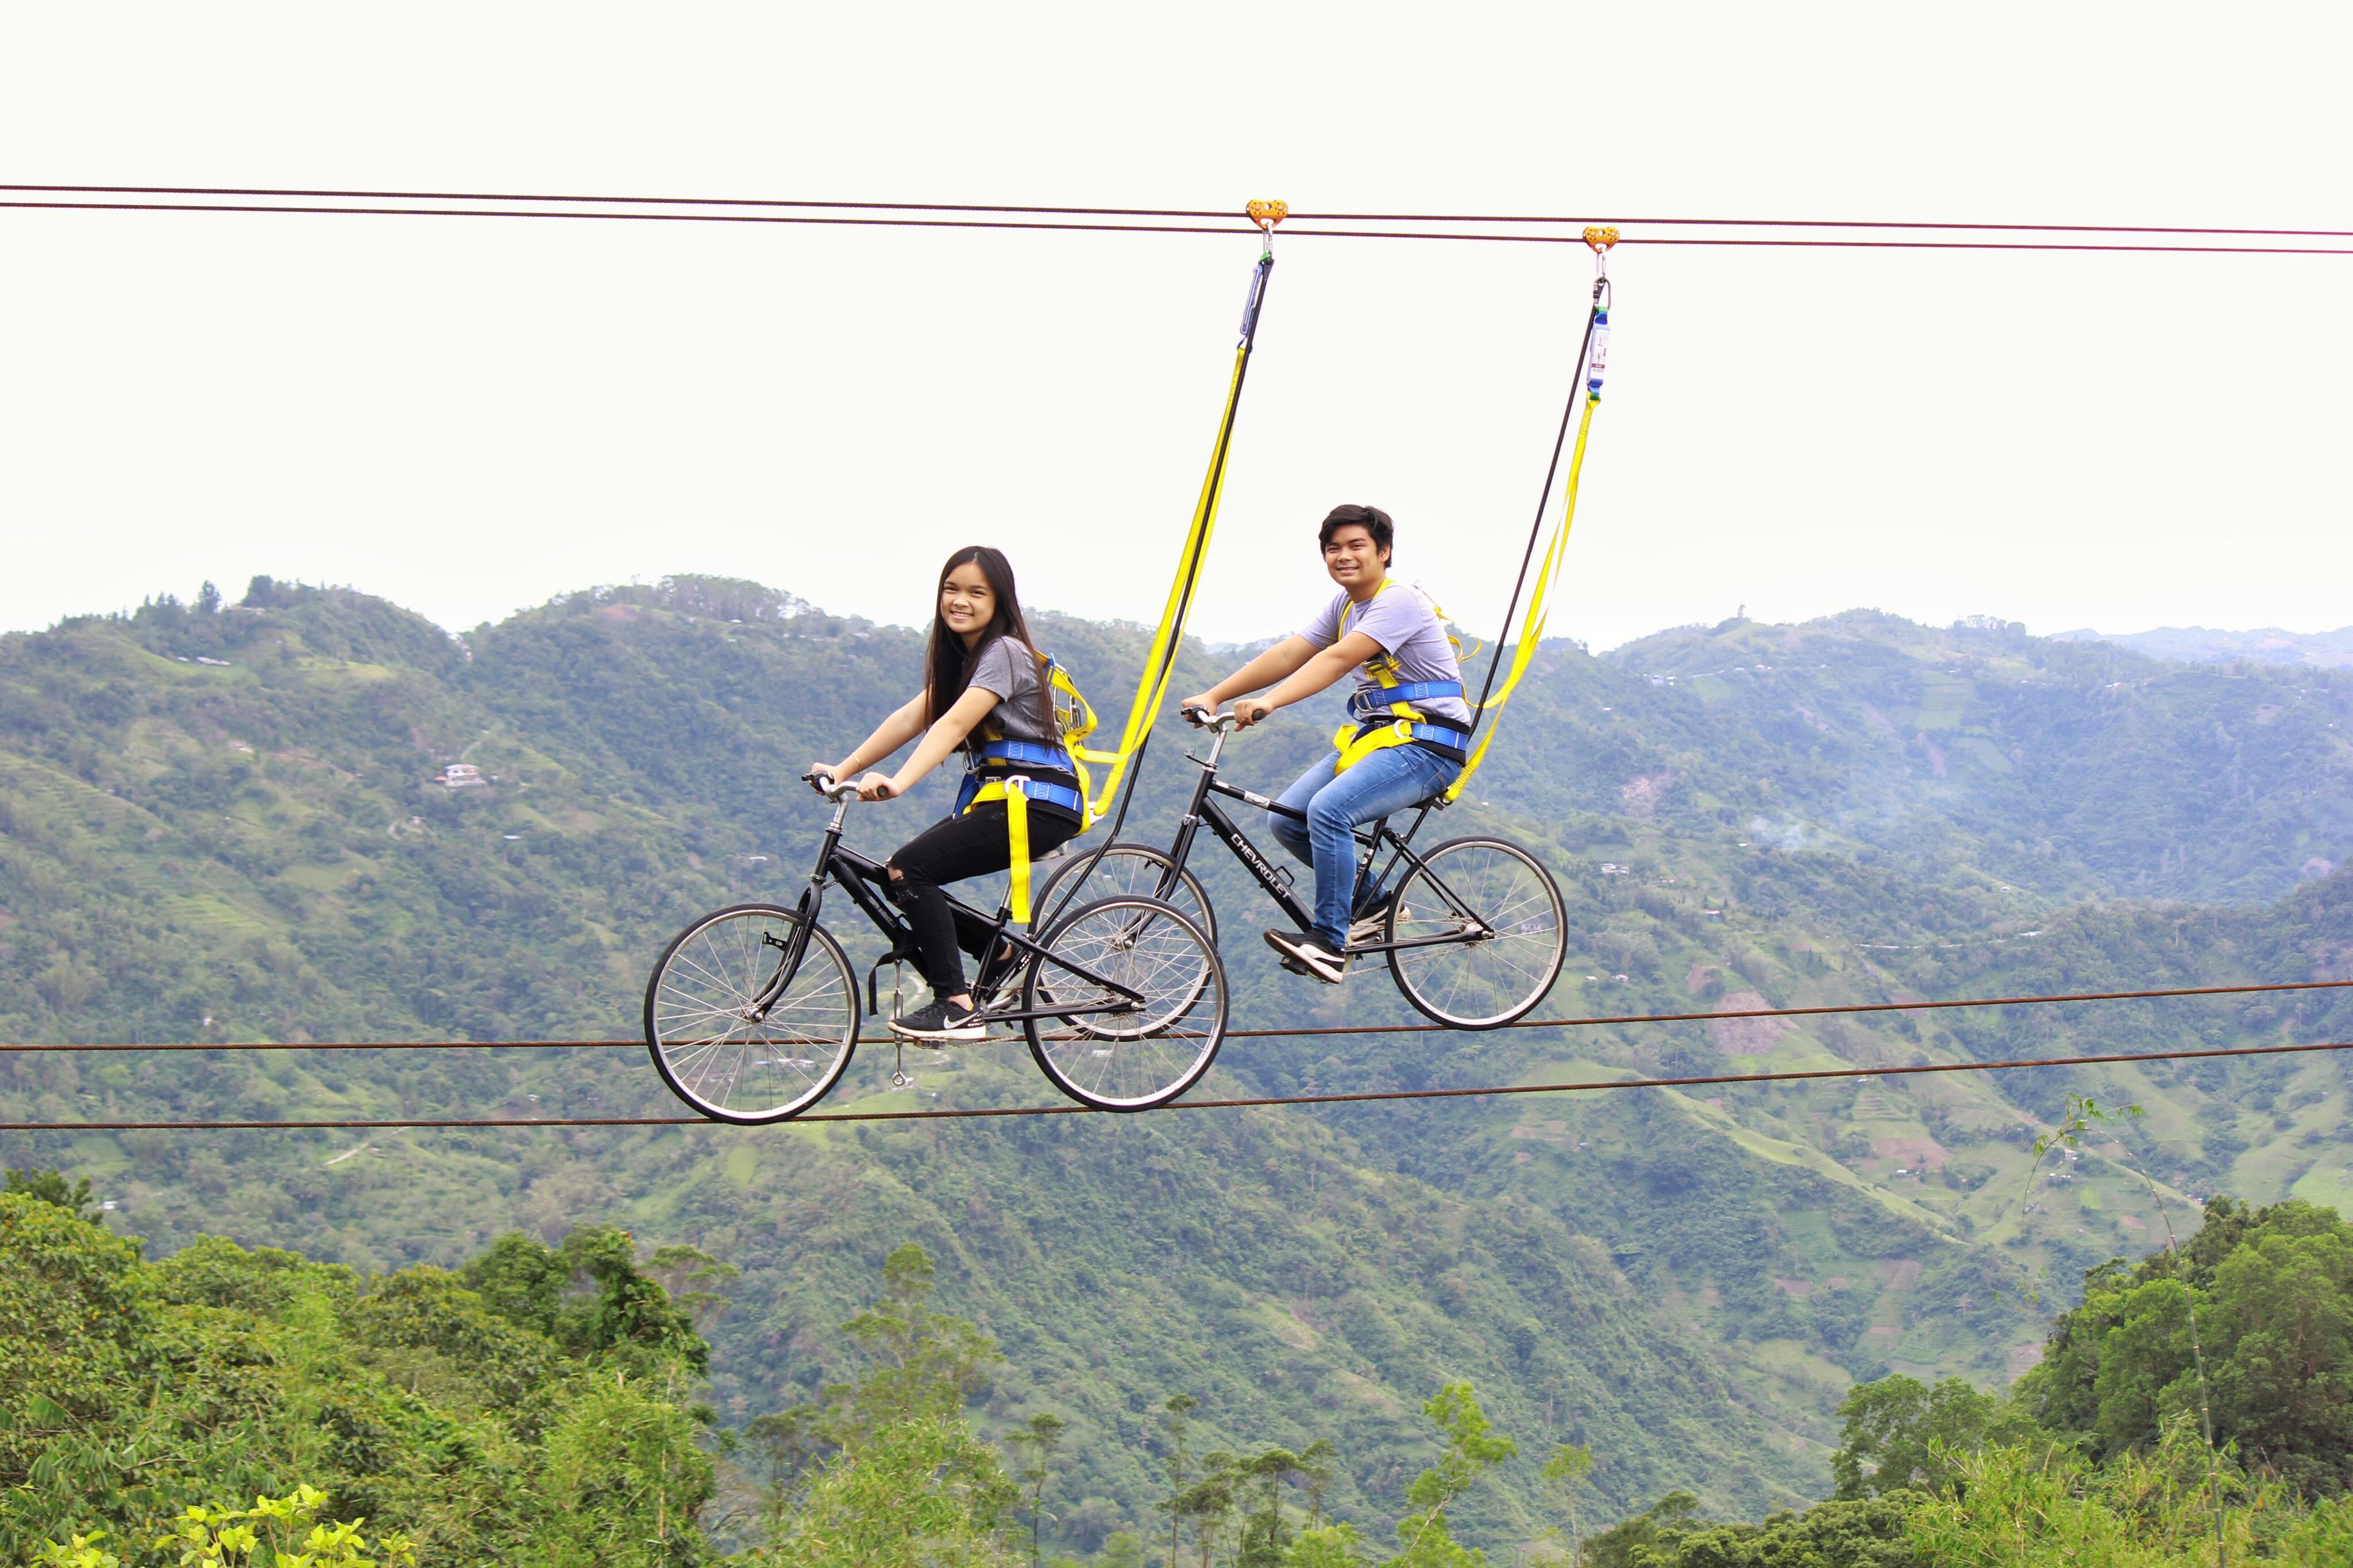 tandem skybiking baguio de cebu